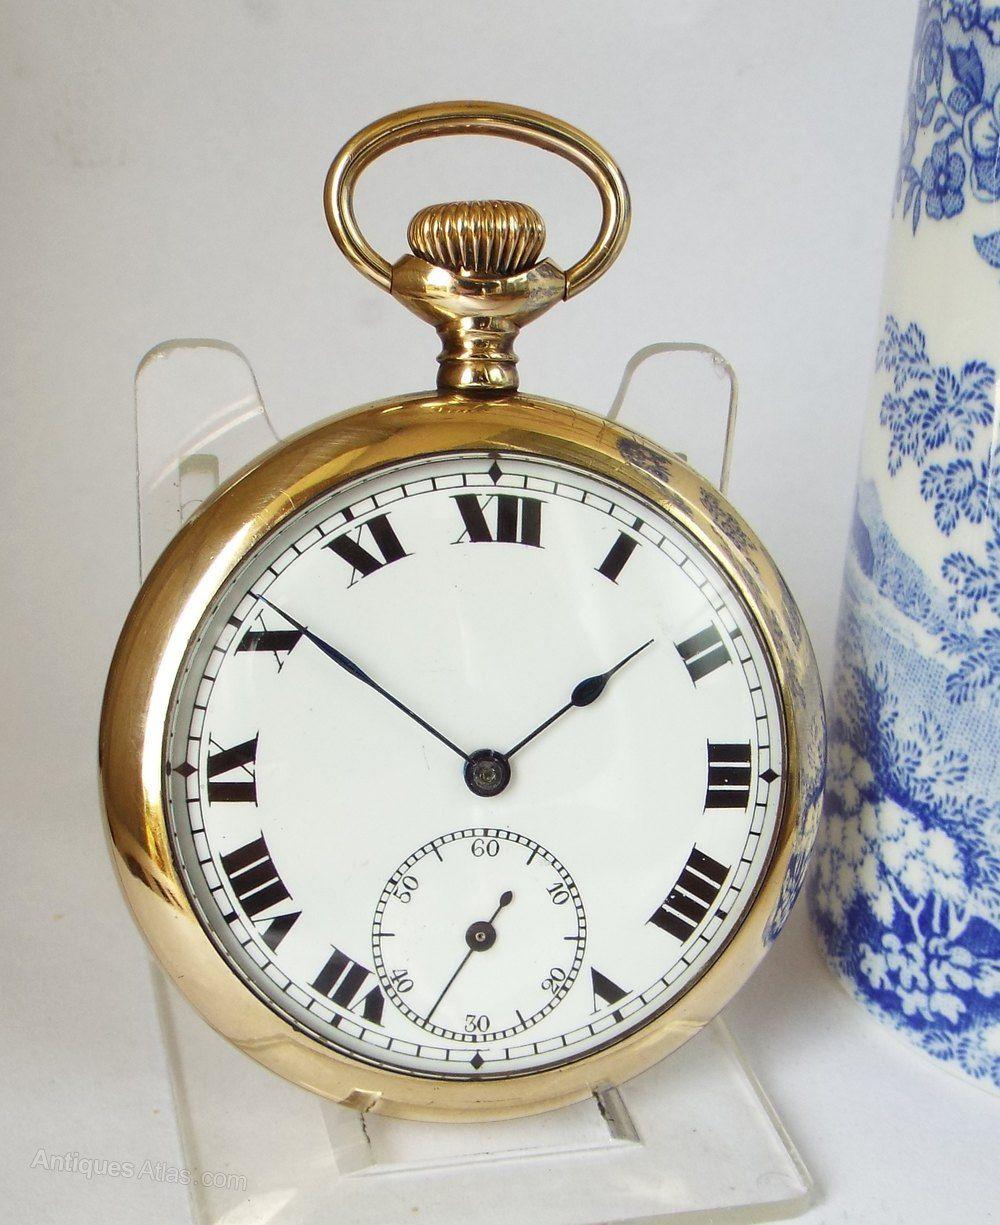 9488e0b16 A 1920s Swiss pocket watch in 2019 | valori | Swiss pocket watches ...